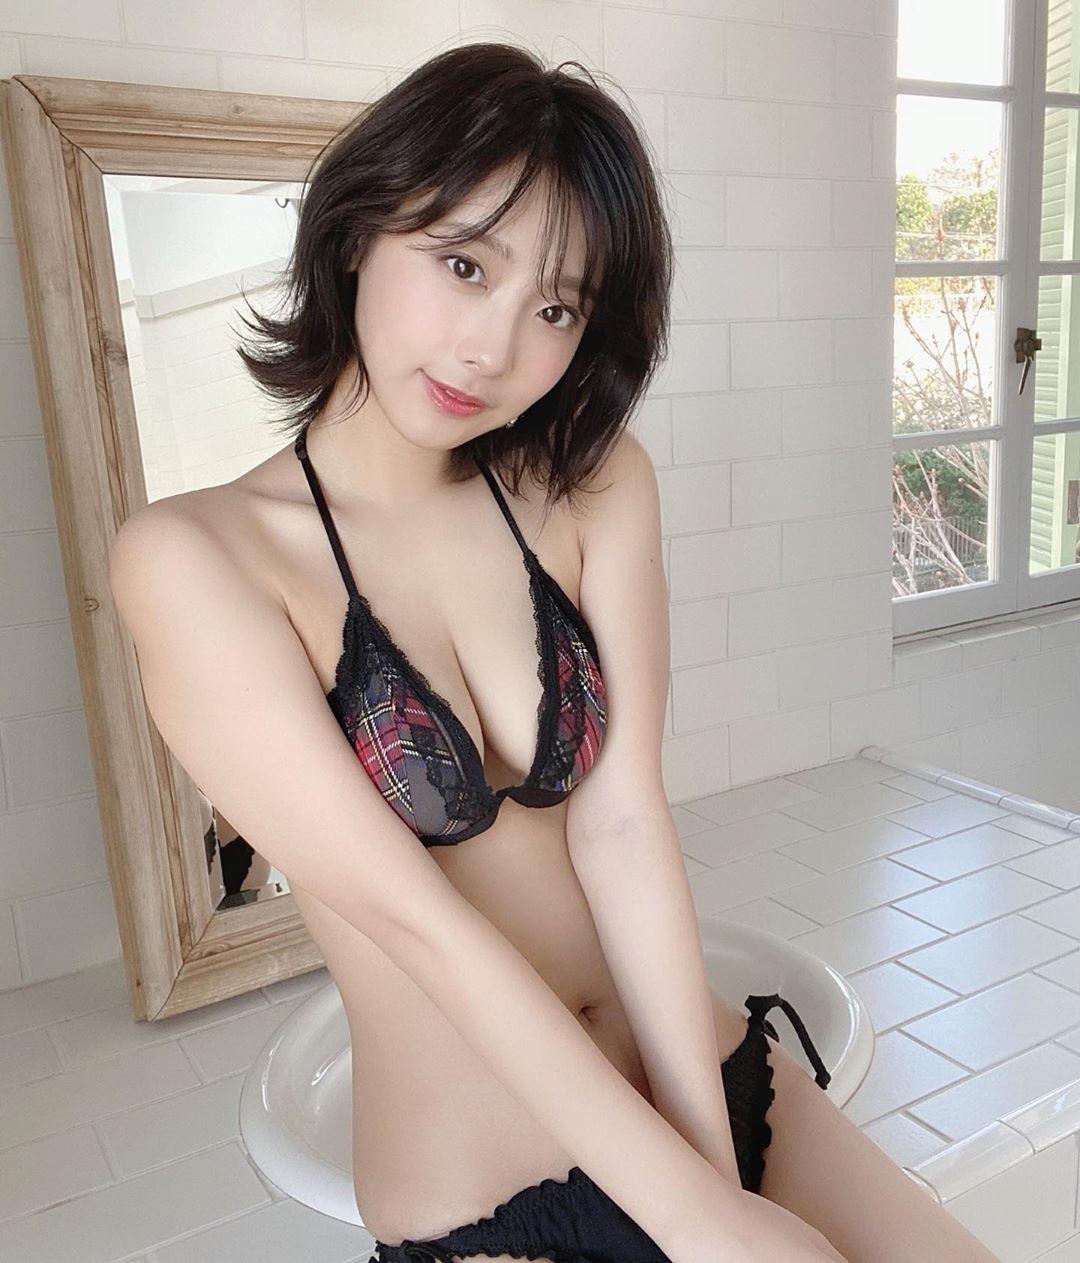 Ma0nnftp o - IG正妹—水湊みお Mio Minato